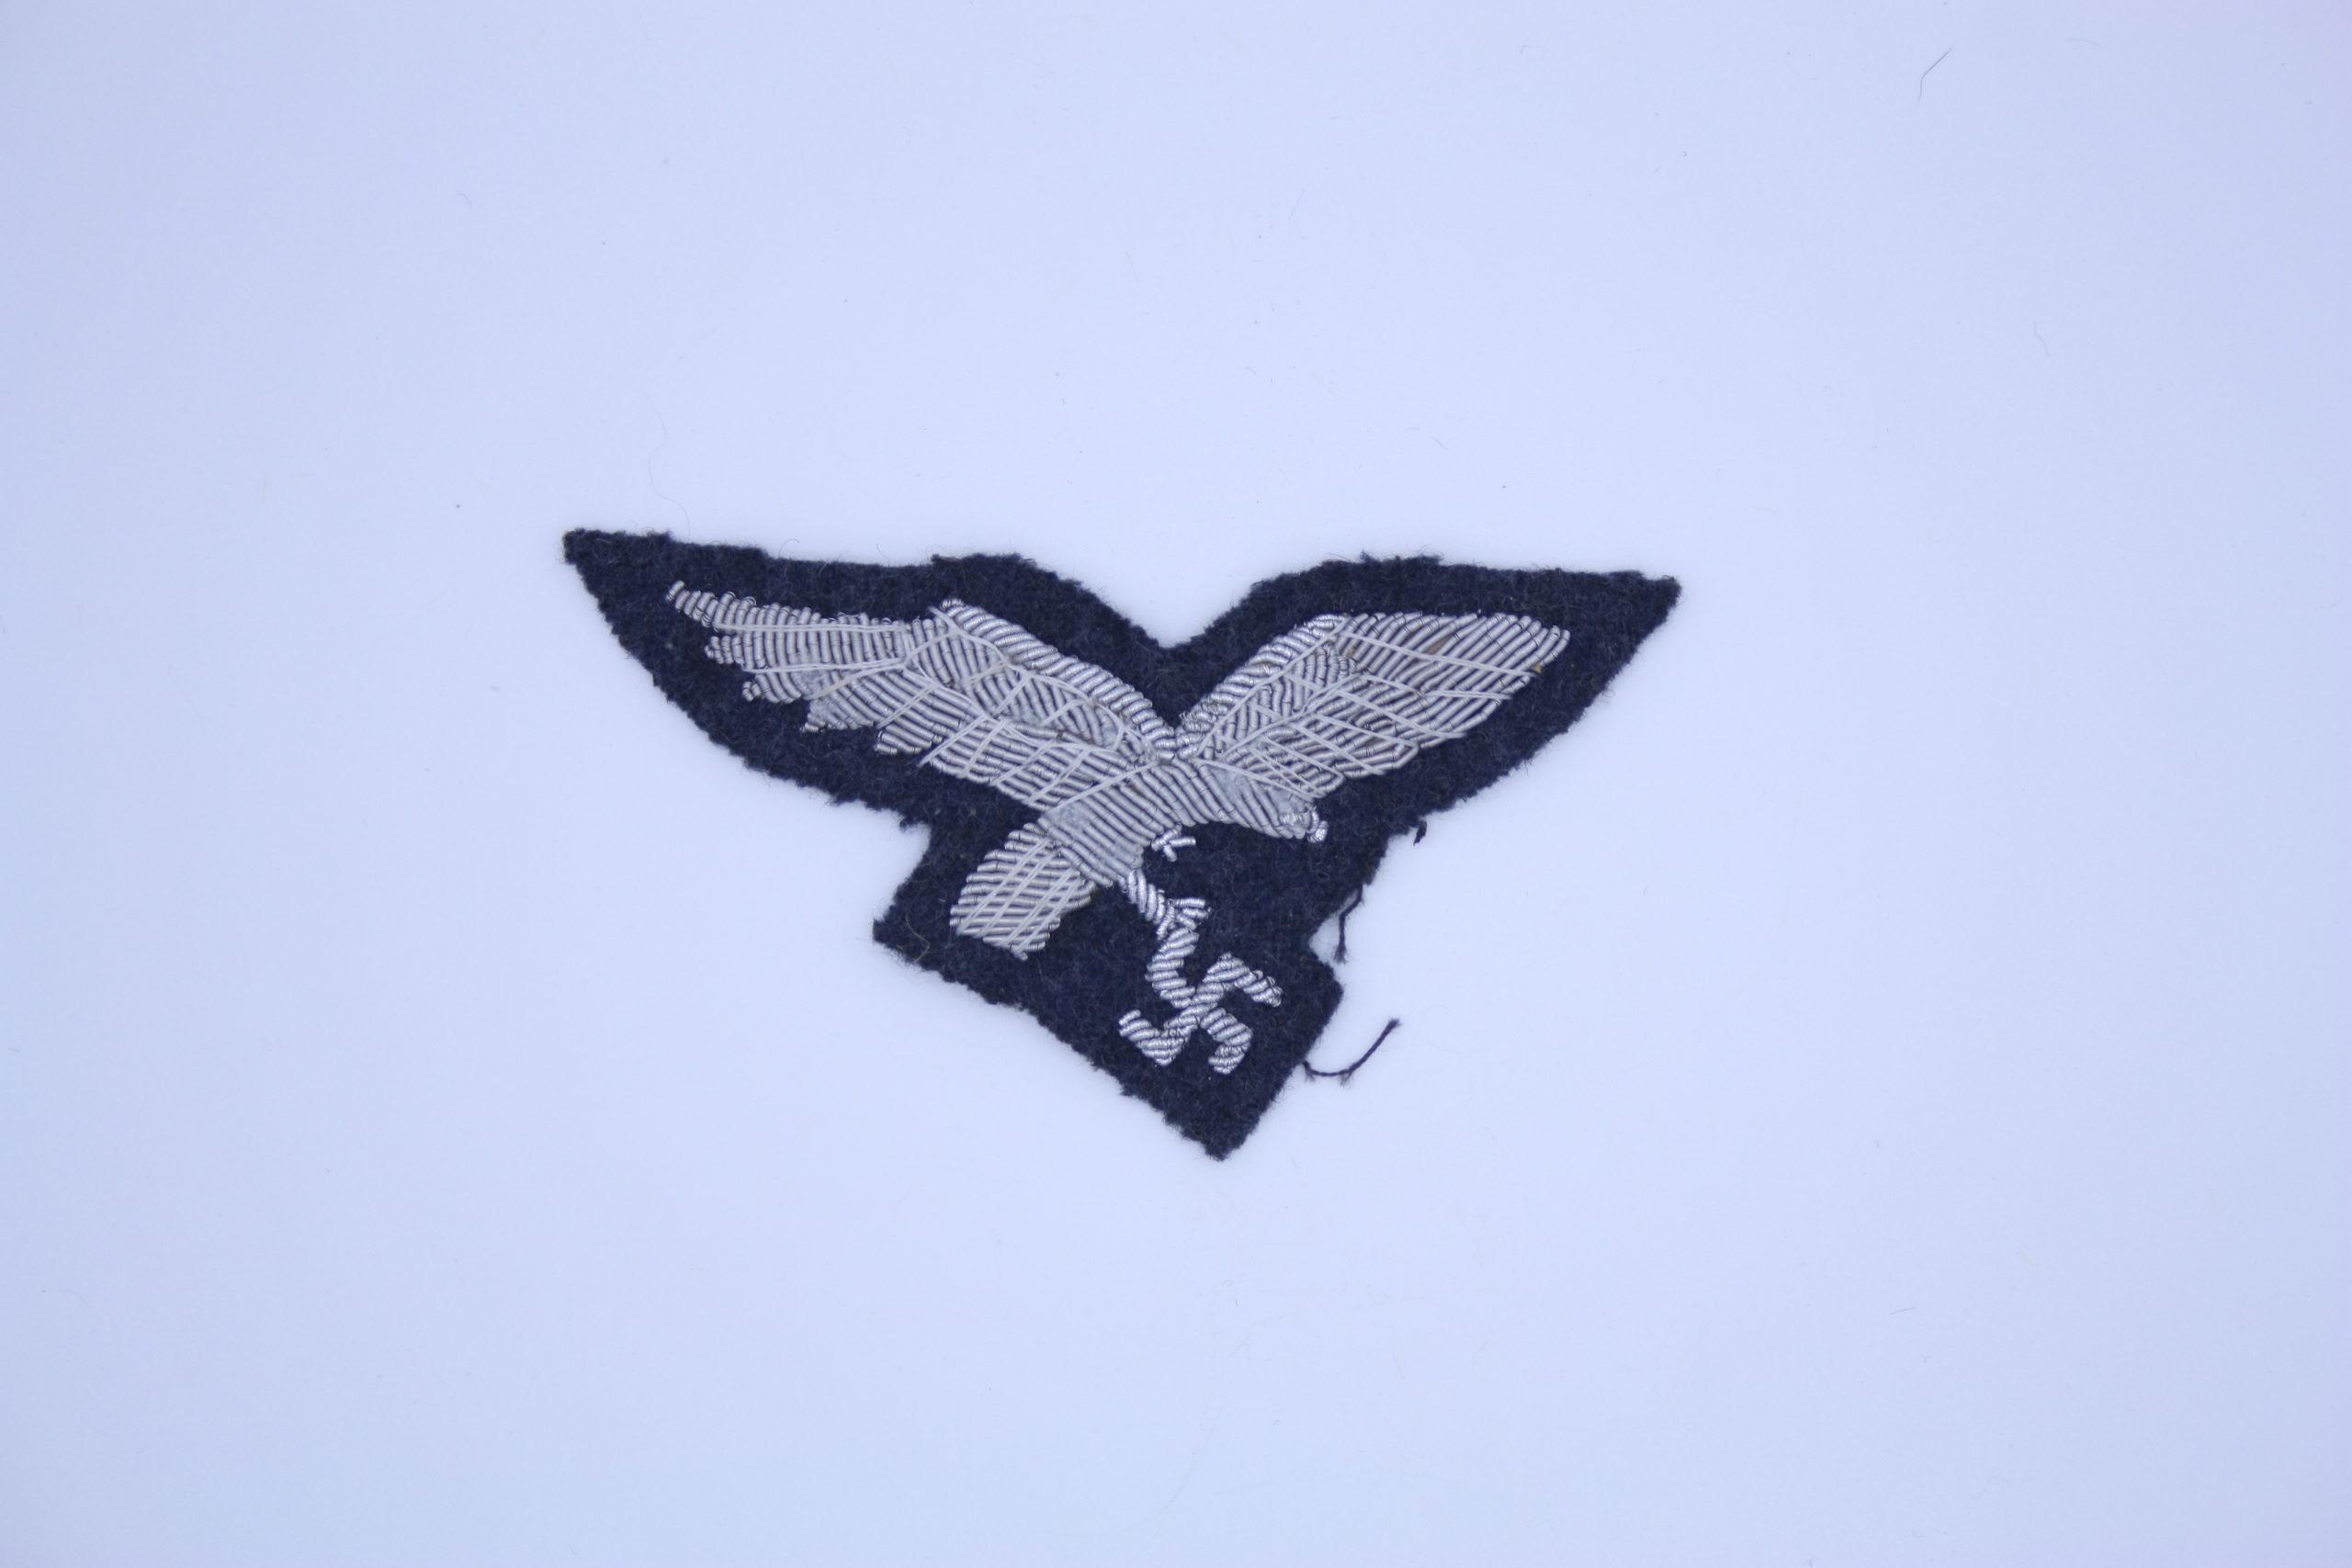 Militaria - Insigne Allemand - Brodé - Luftwaffe - Officier